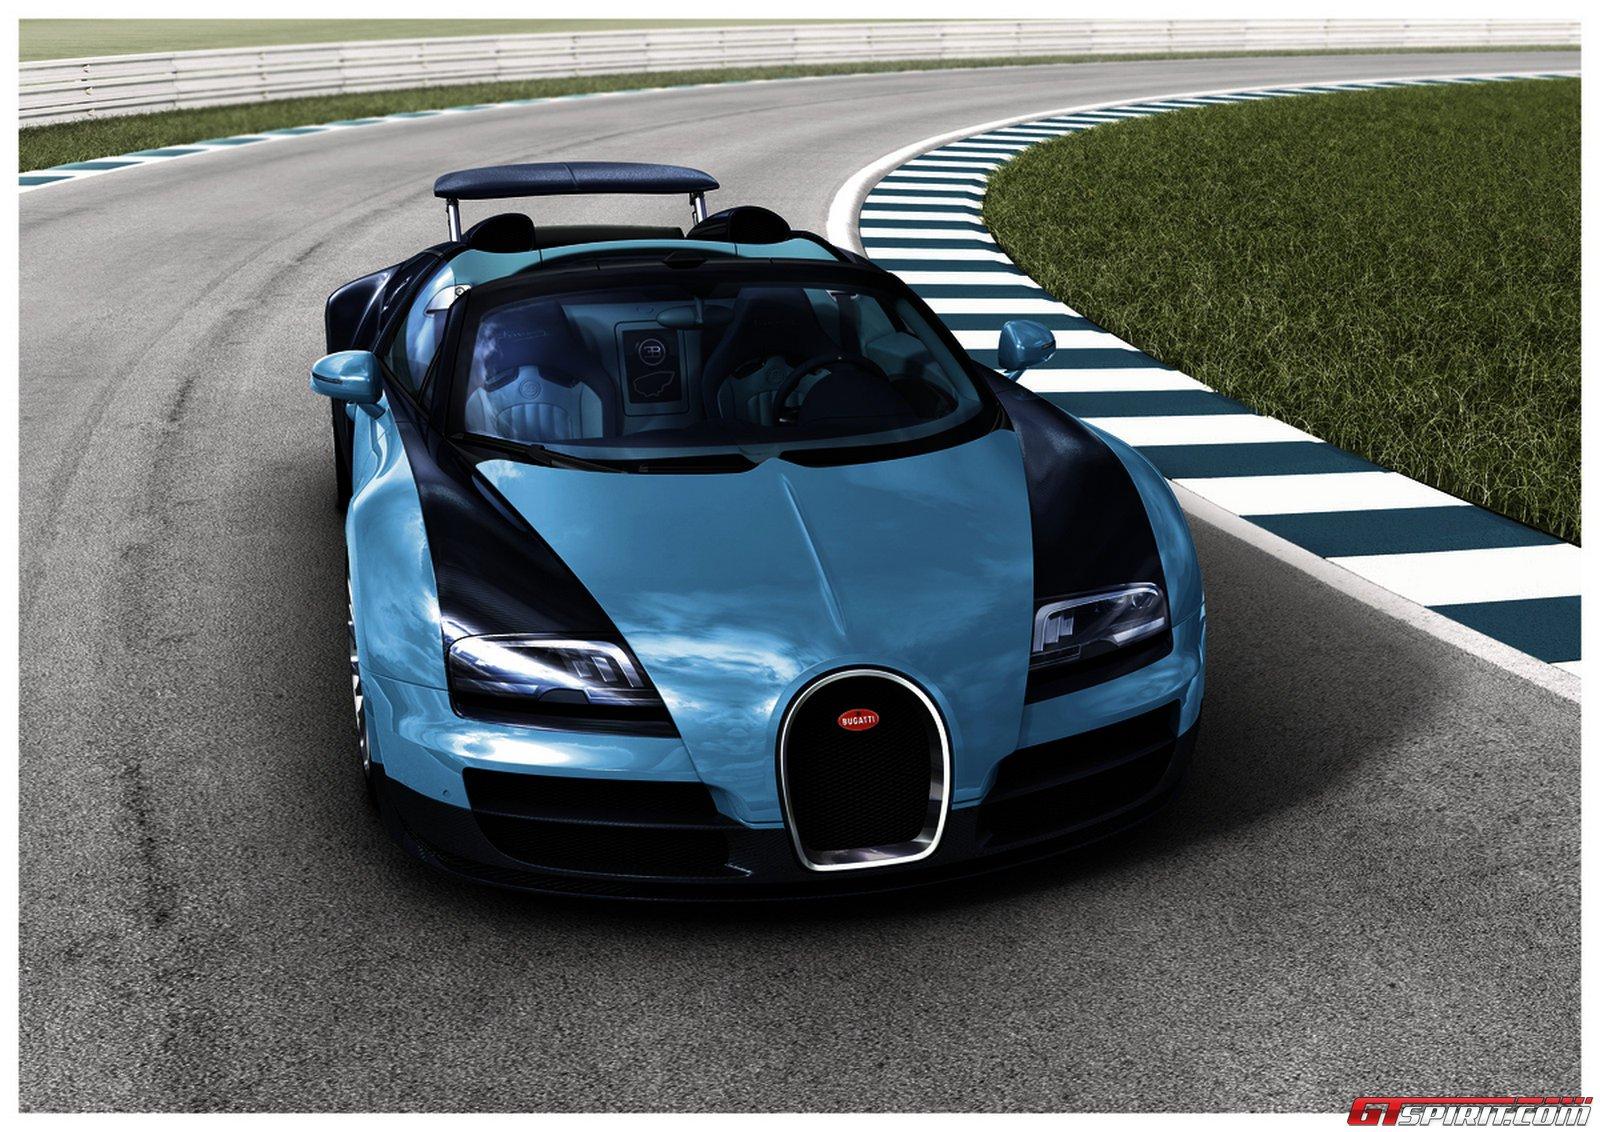 gtspirit top 10 bugatti veyron special editions. Black Bedroom Furniture Sets. Home Design Ideas